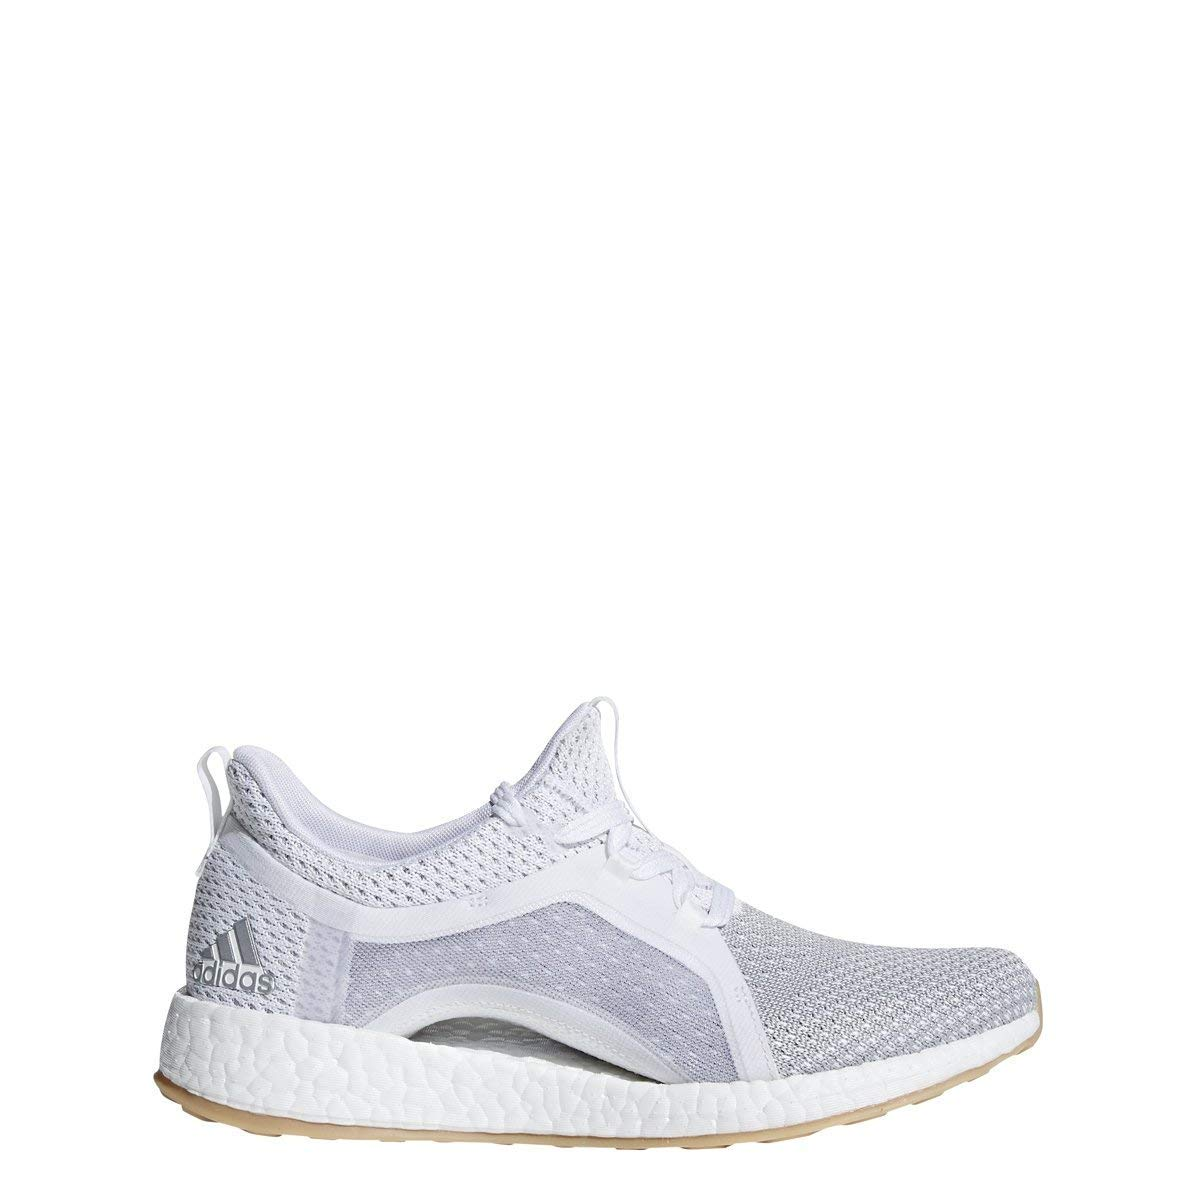 best authentic b6e42 b098d Amazon.com   adidas Pureboost X Clima Shoe Women s Running White   Road  Running